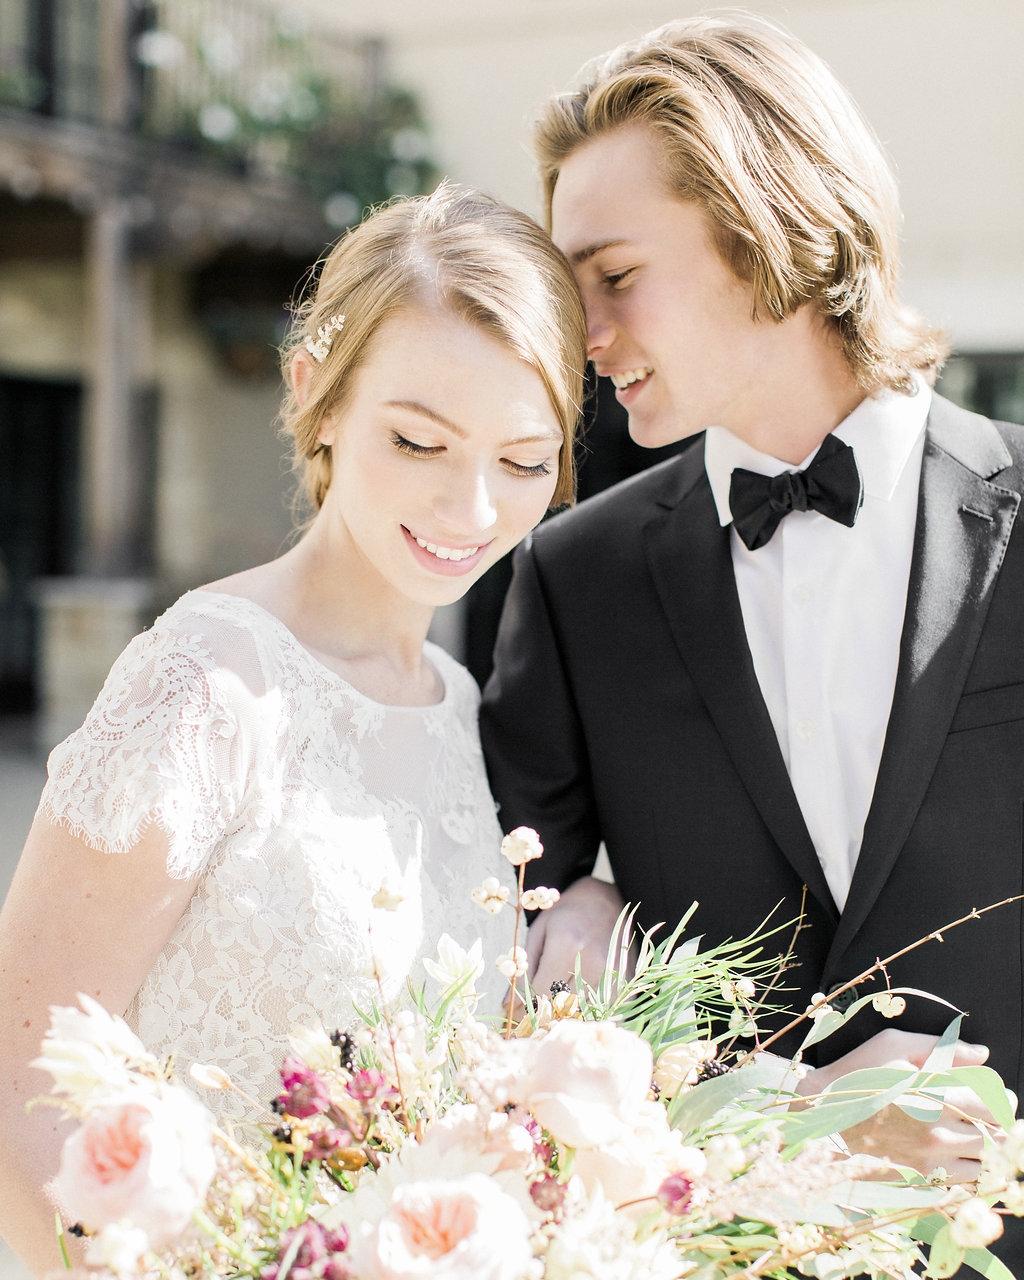 st.louis-missouri-silver-oaks-chateau-wedding-139.jpg